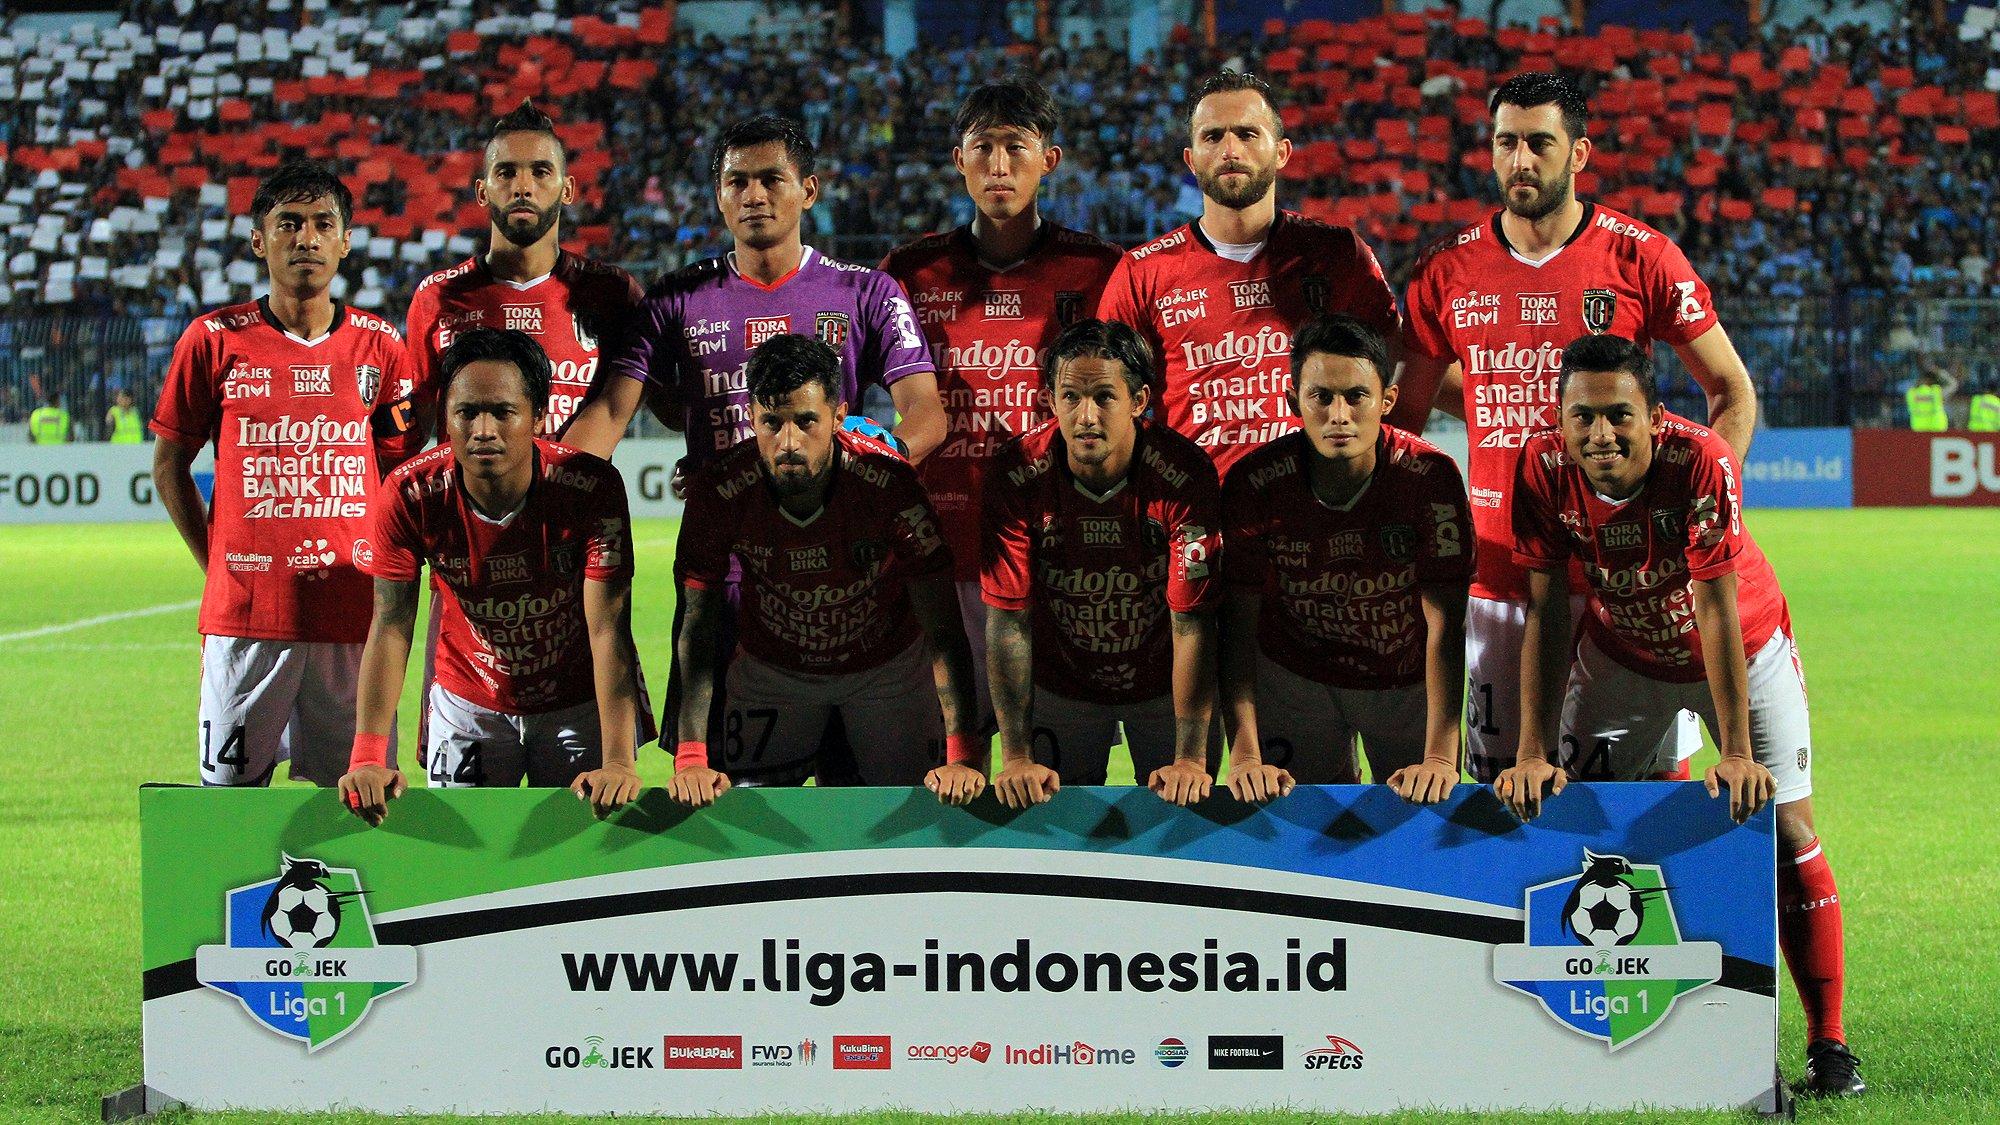 Bali United Bertekad Pertahankan Performa Impresif - https://t.co/xsBGPQk0NV https://t.co/1NHhvpOaZC